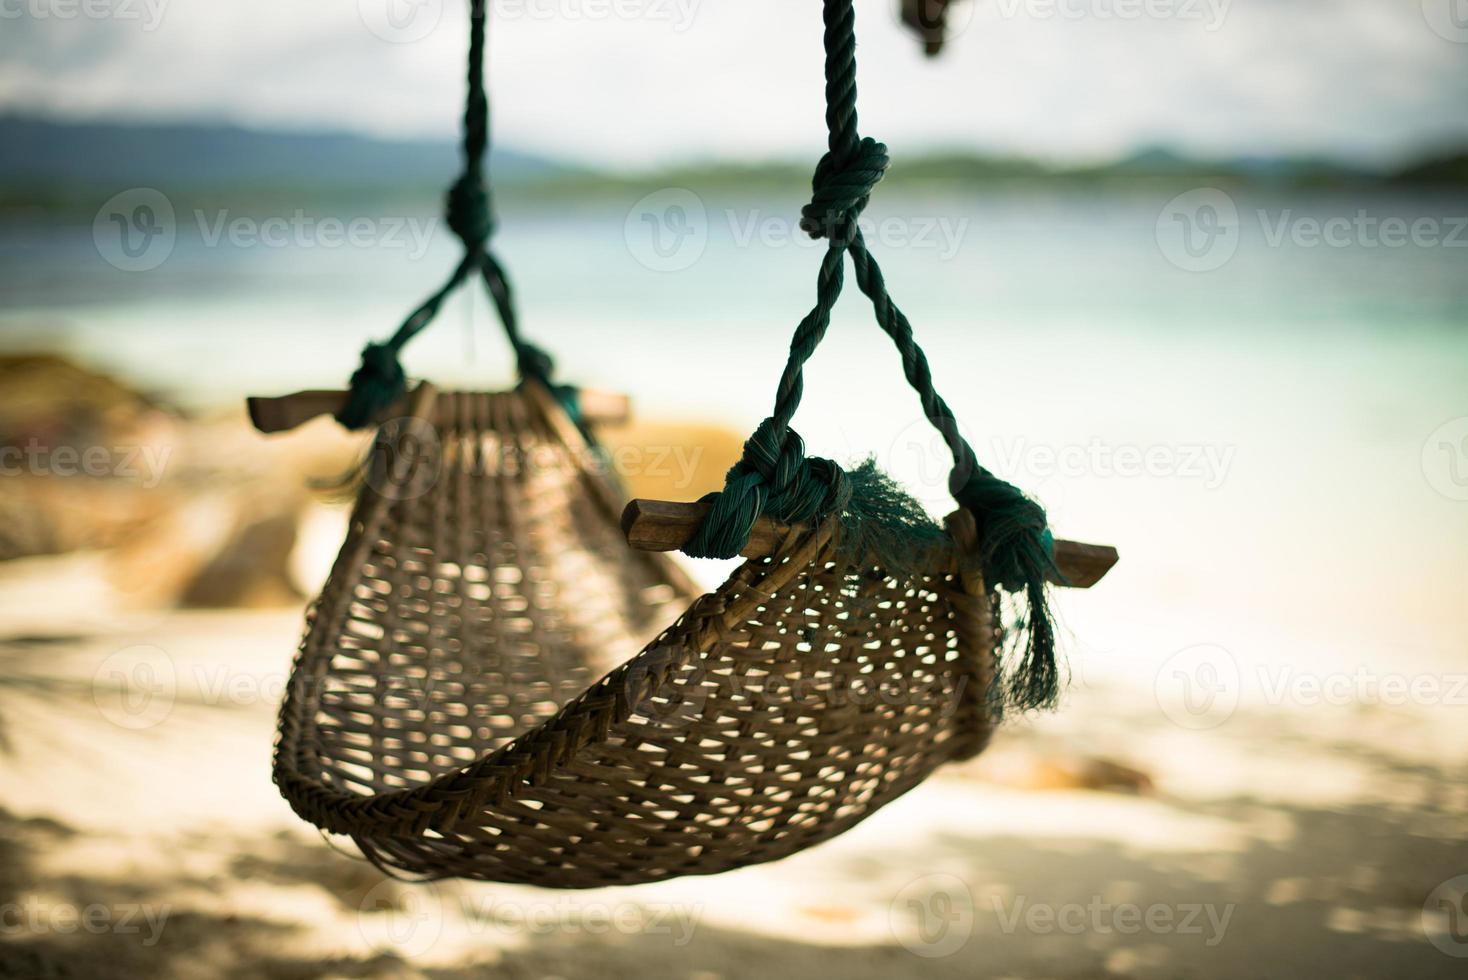 relajarse en una playa tropical foto